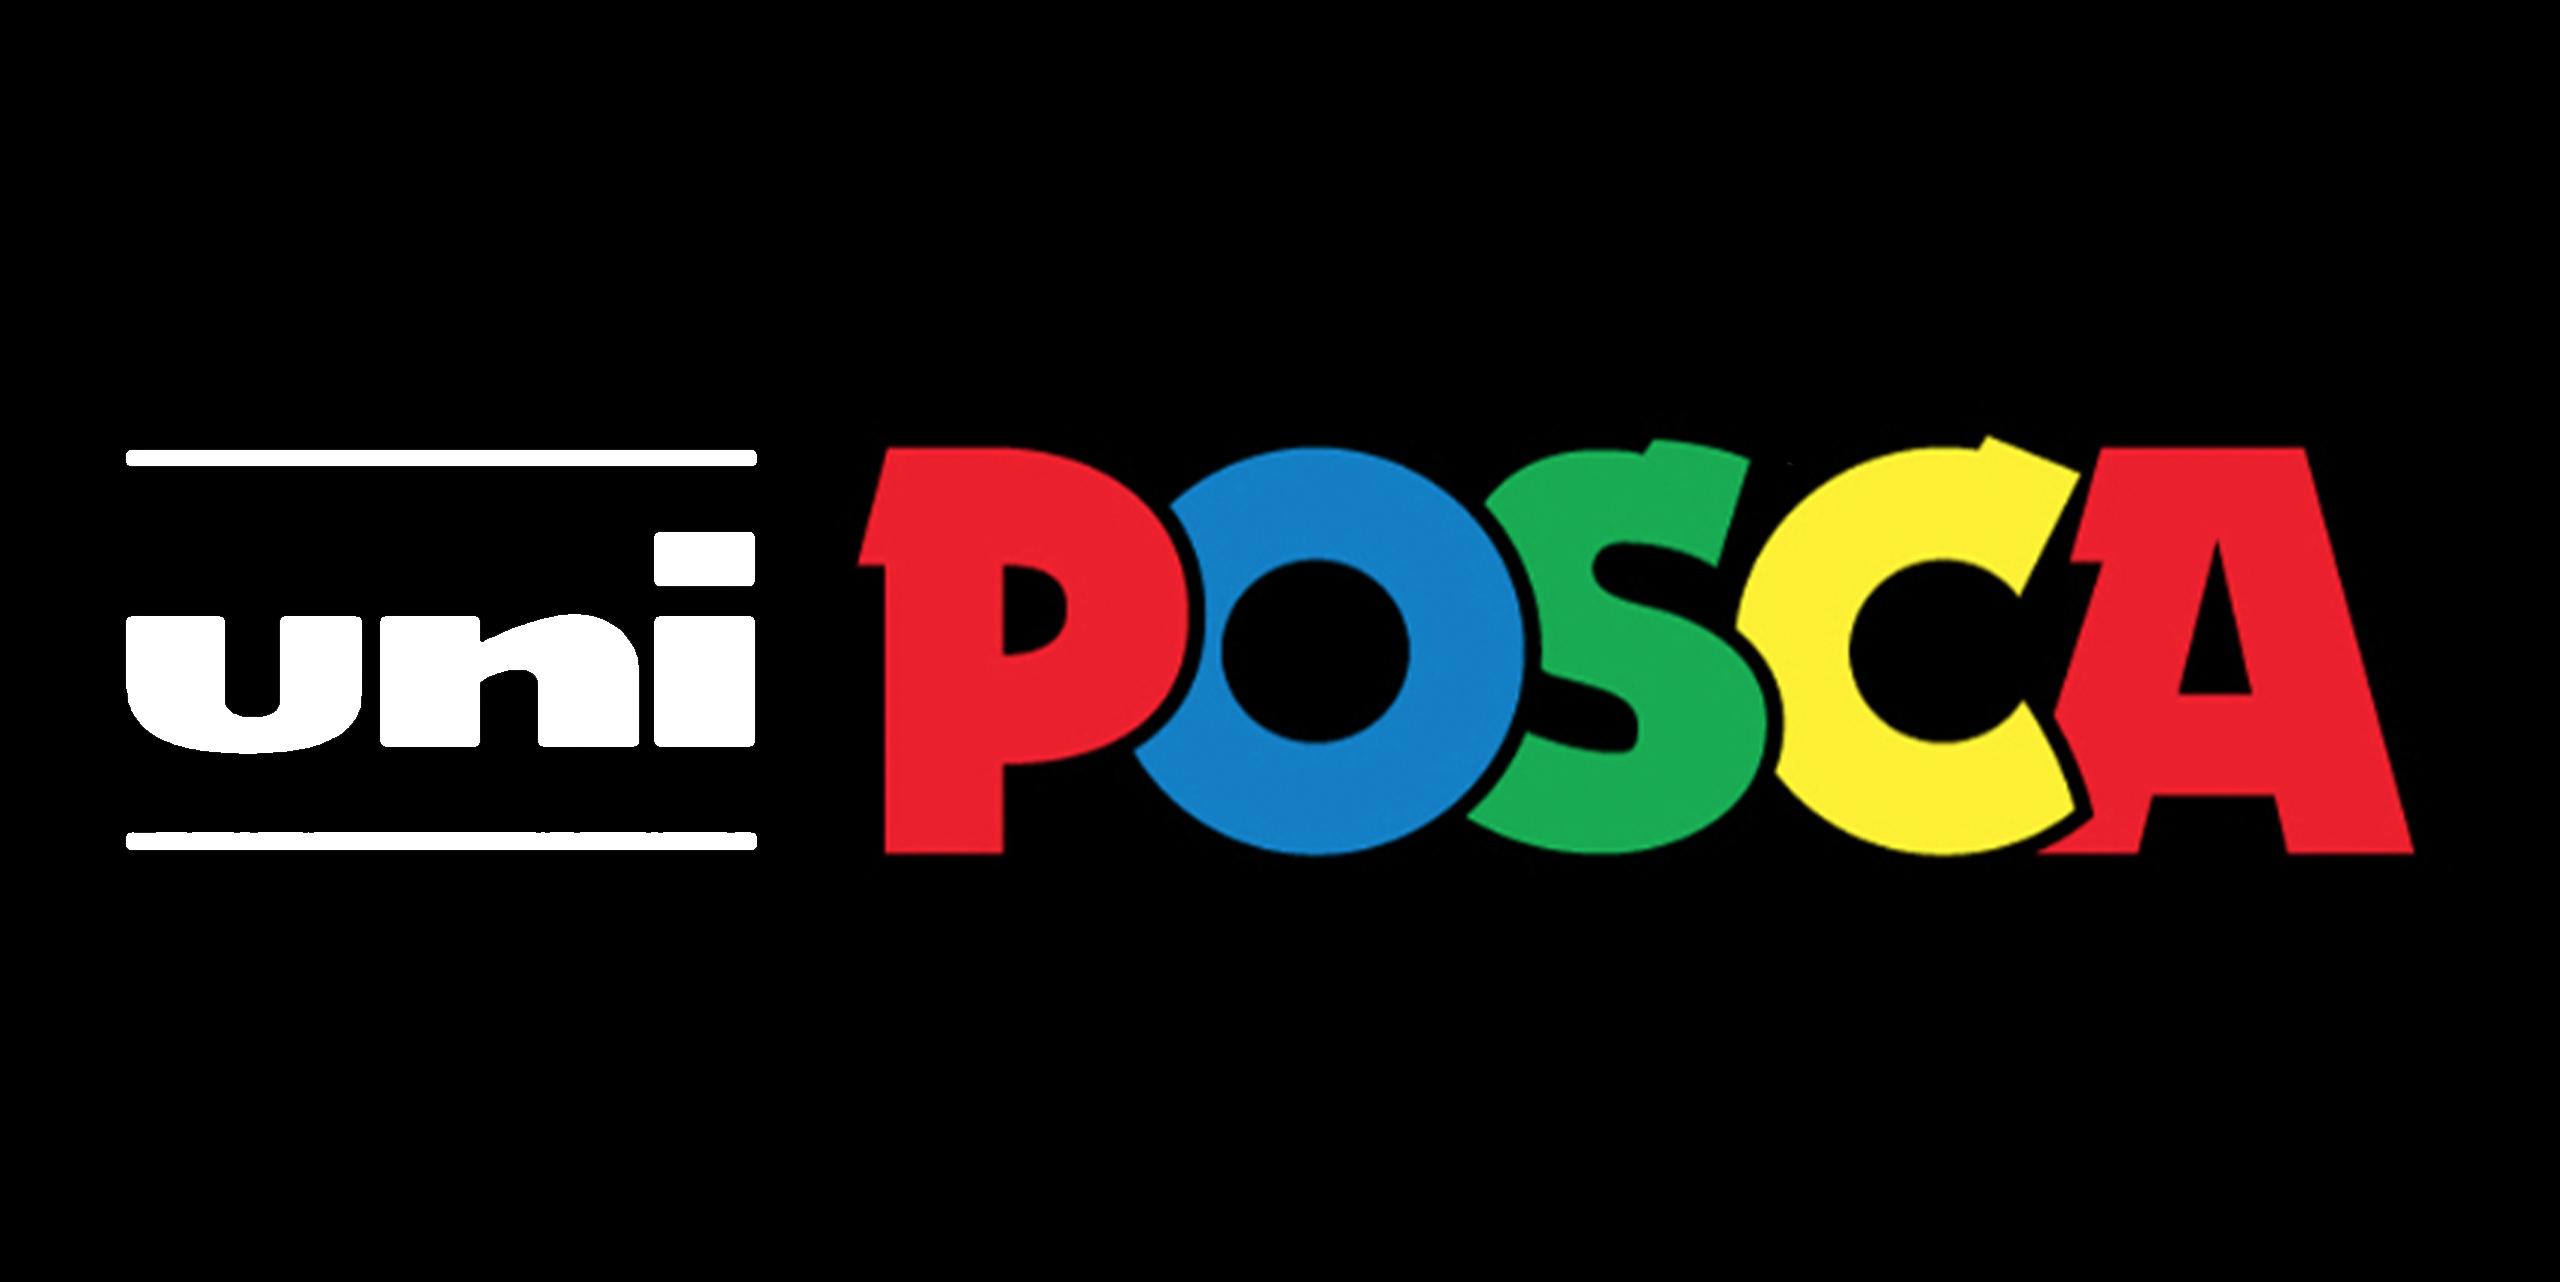 بوسكا | Posca